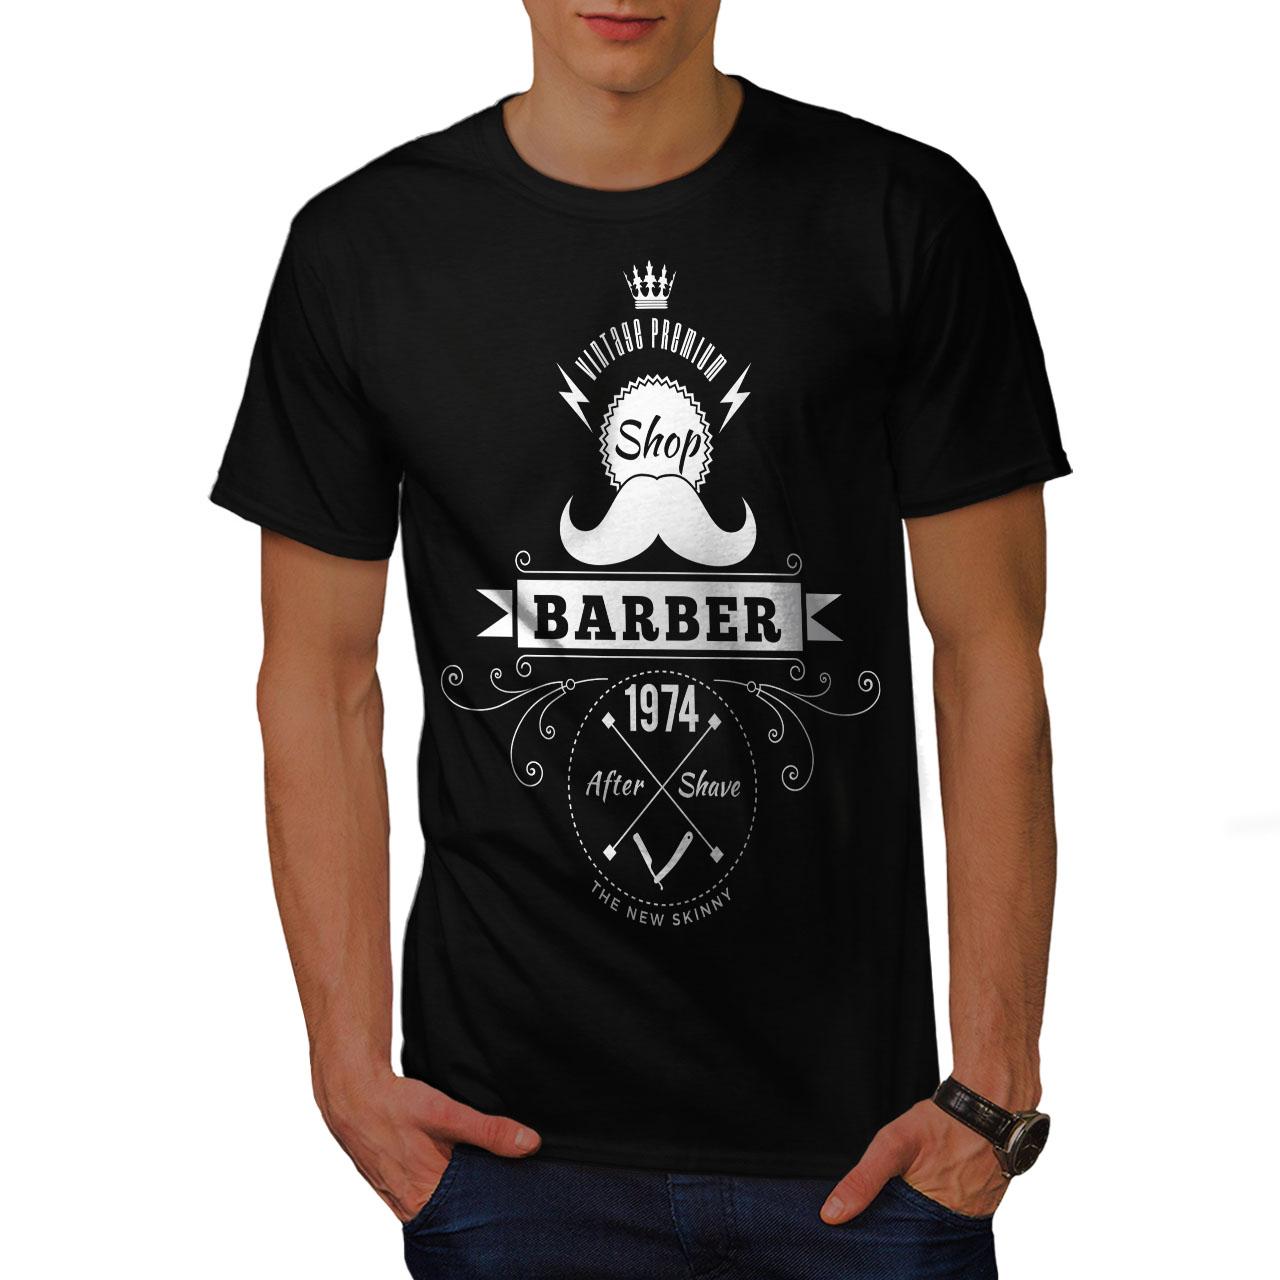 Wellcoda-Barber-Shop-Mens-T-shirt-Hipster-Graphic-Design-Printed-Tee